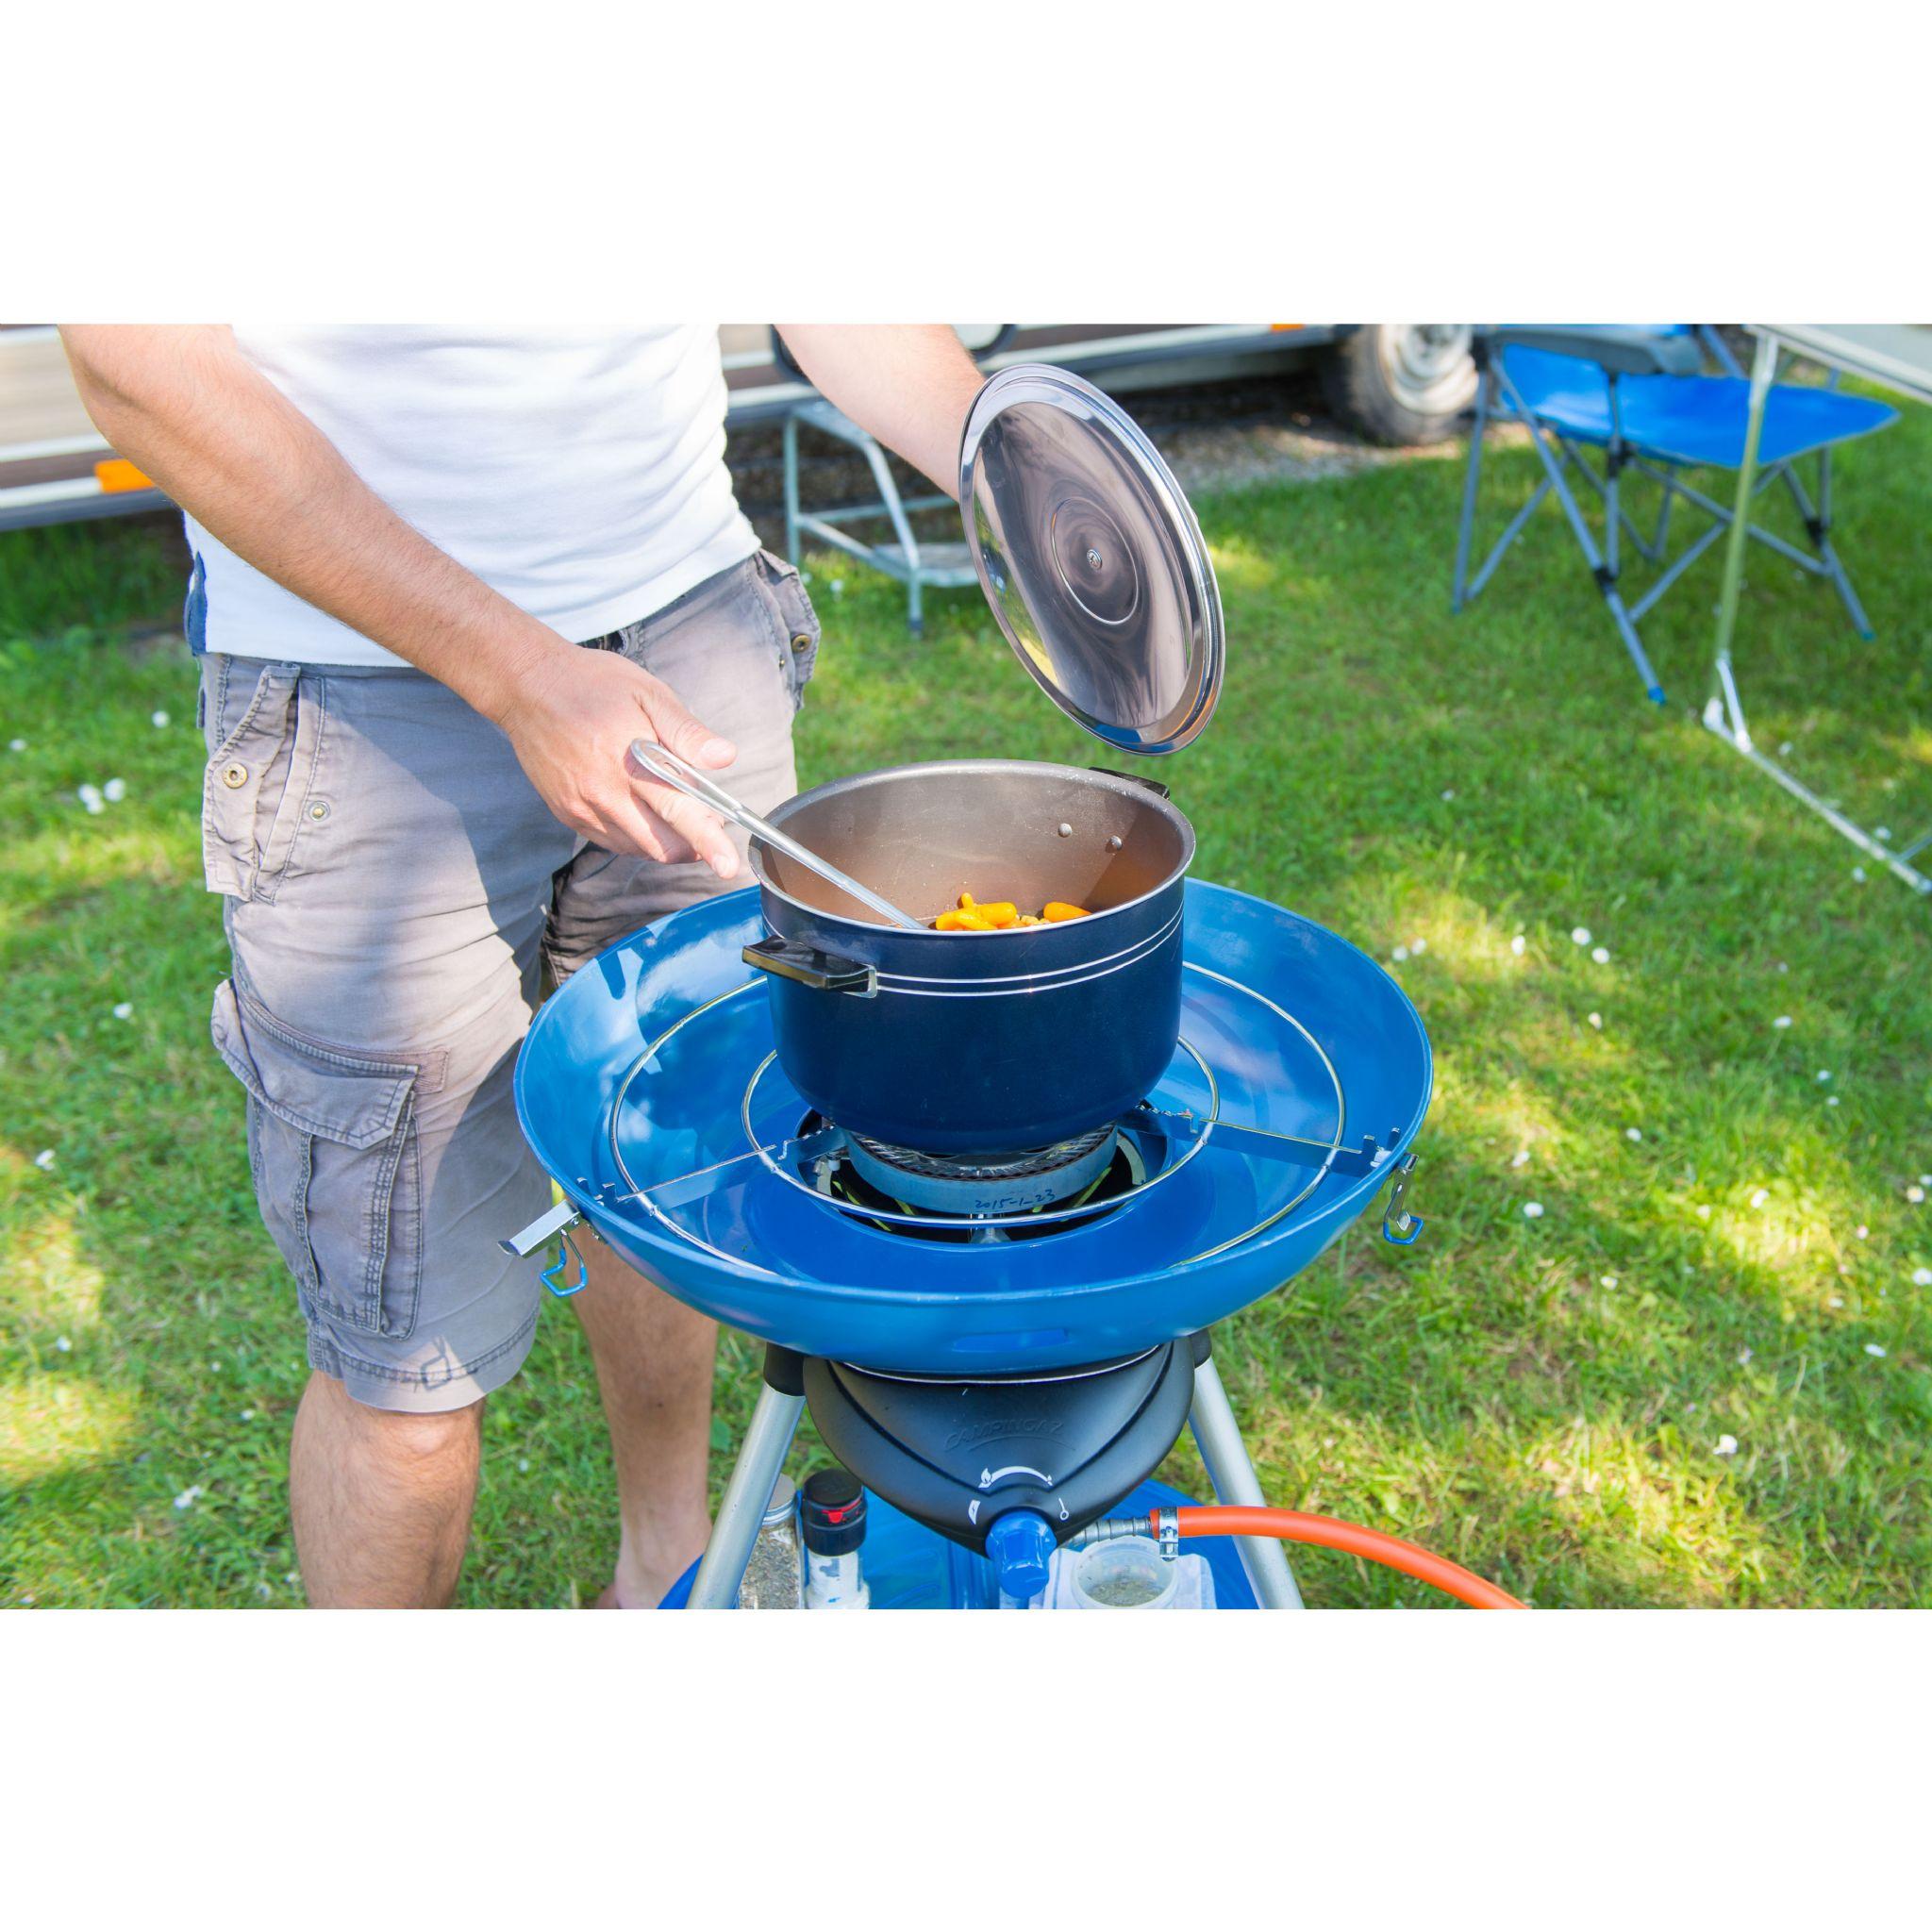 Campingaz Party Grill 600 Camping Stove, Portable Stoves